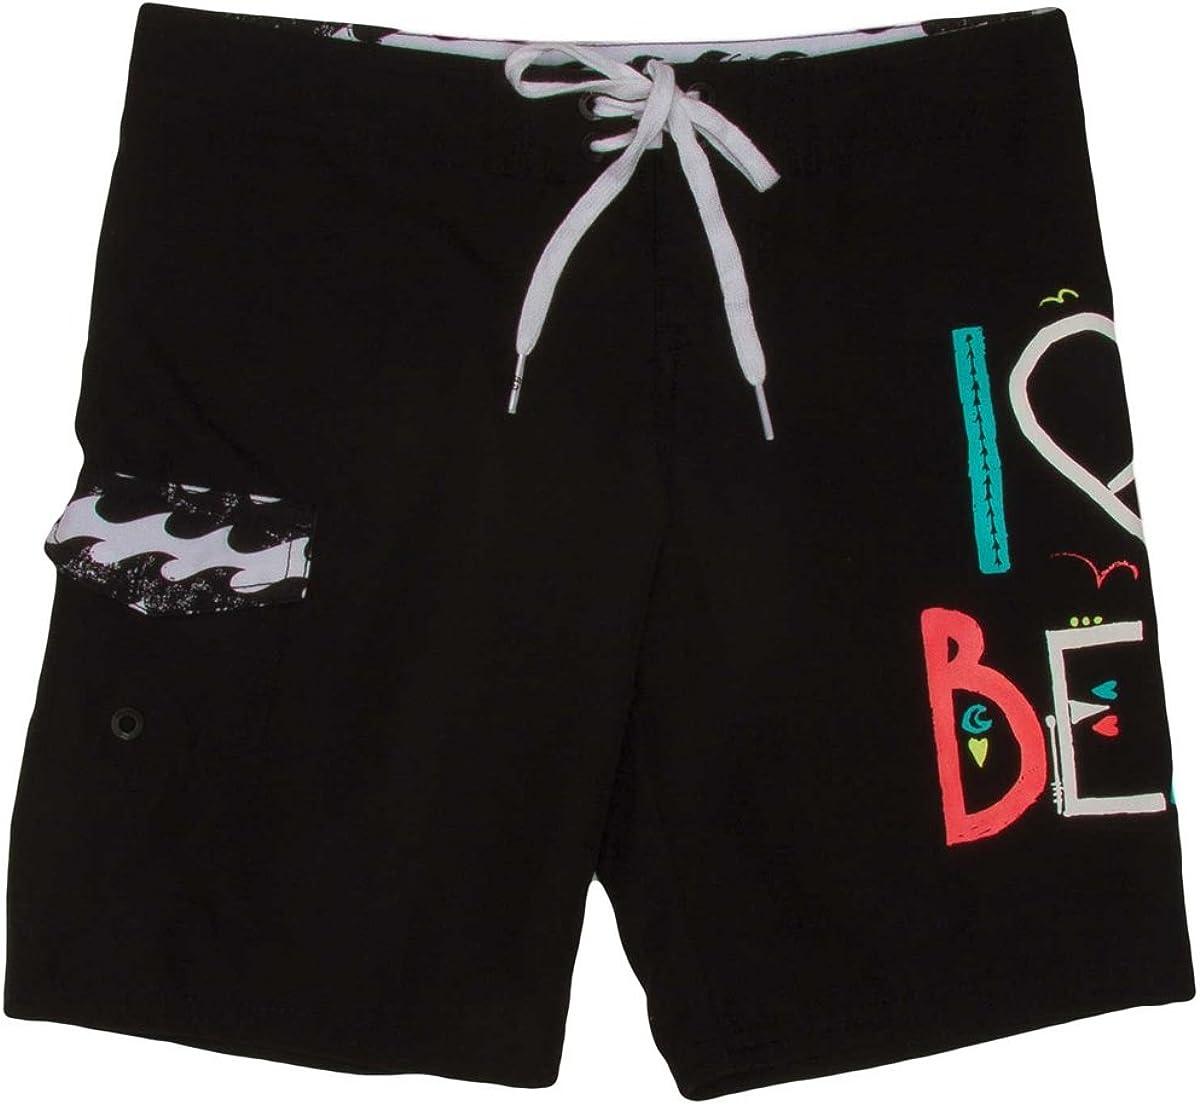 Billabong Girls' Big Night Out Many popular brands Two trust Strappy Piece Set Swim